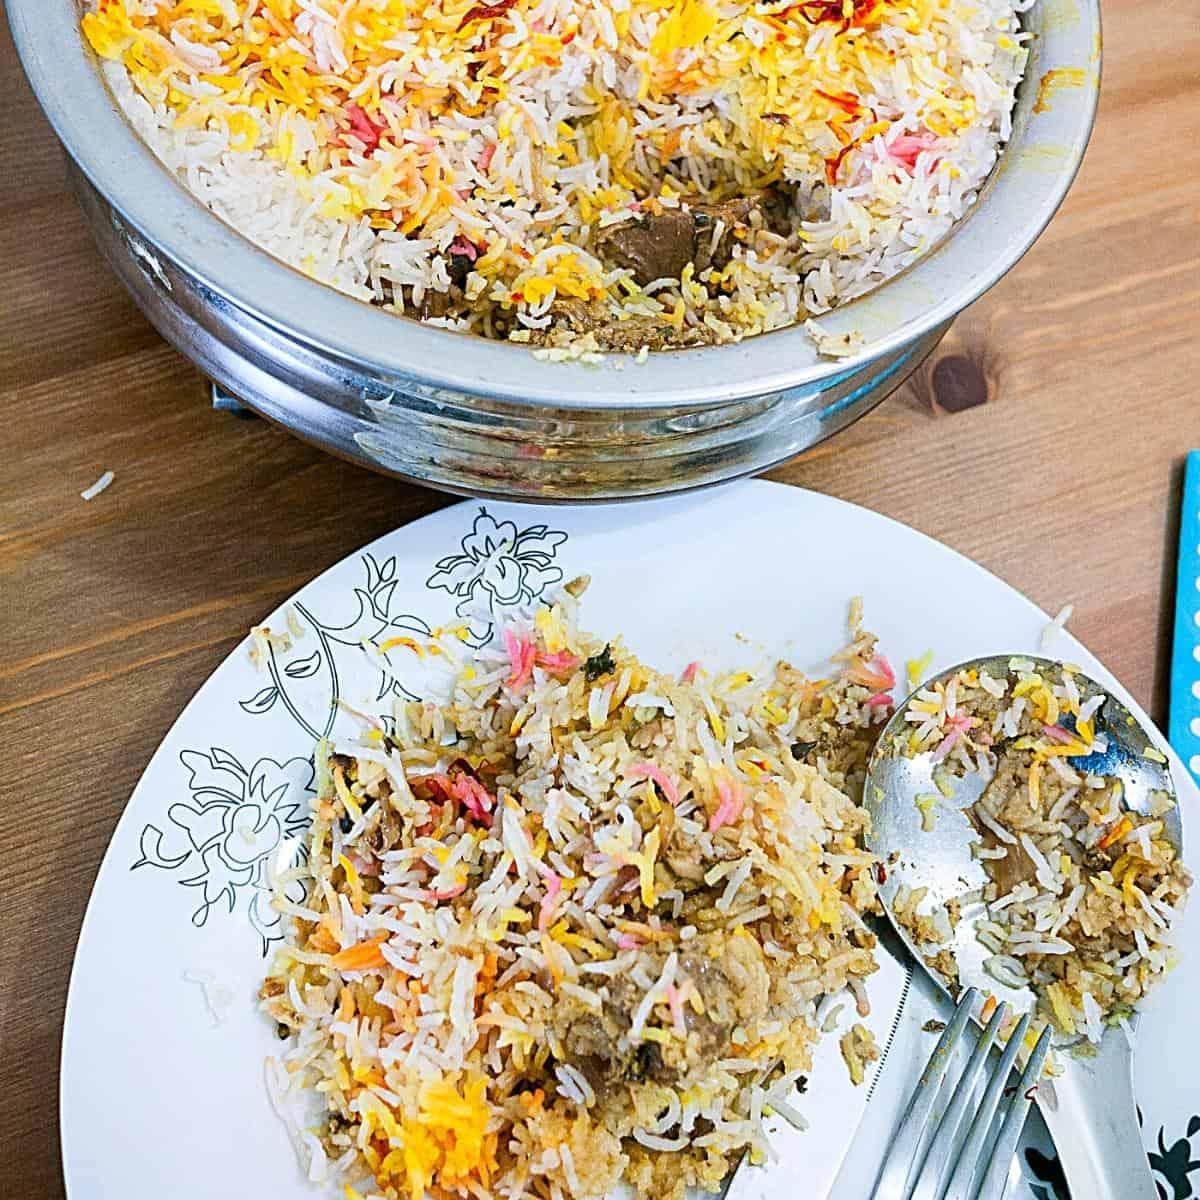 A plate with biryani.